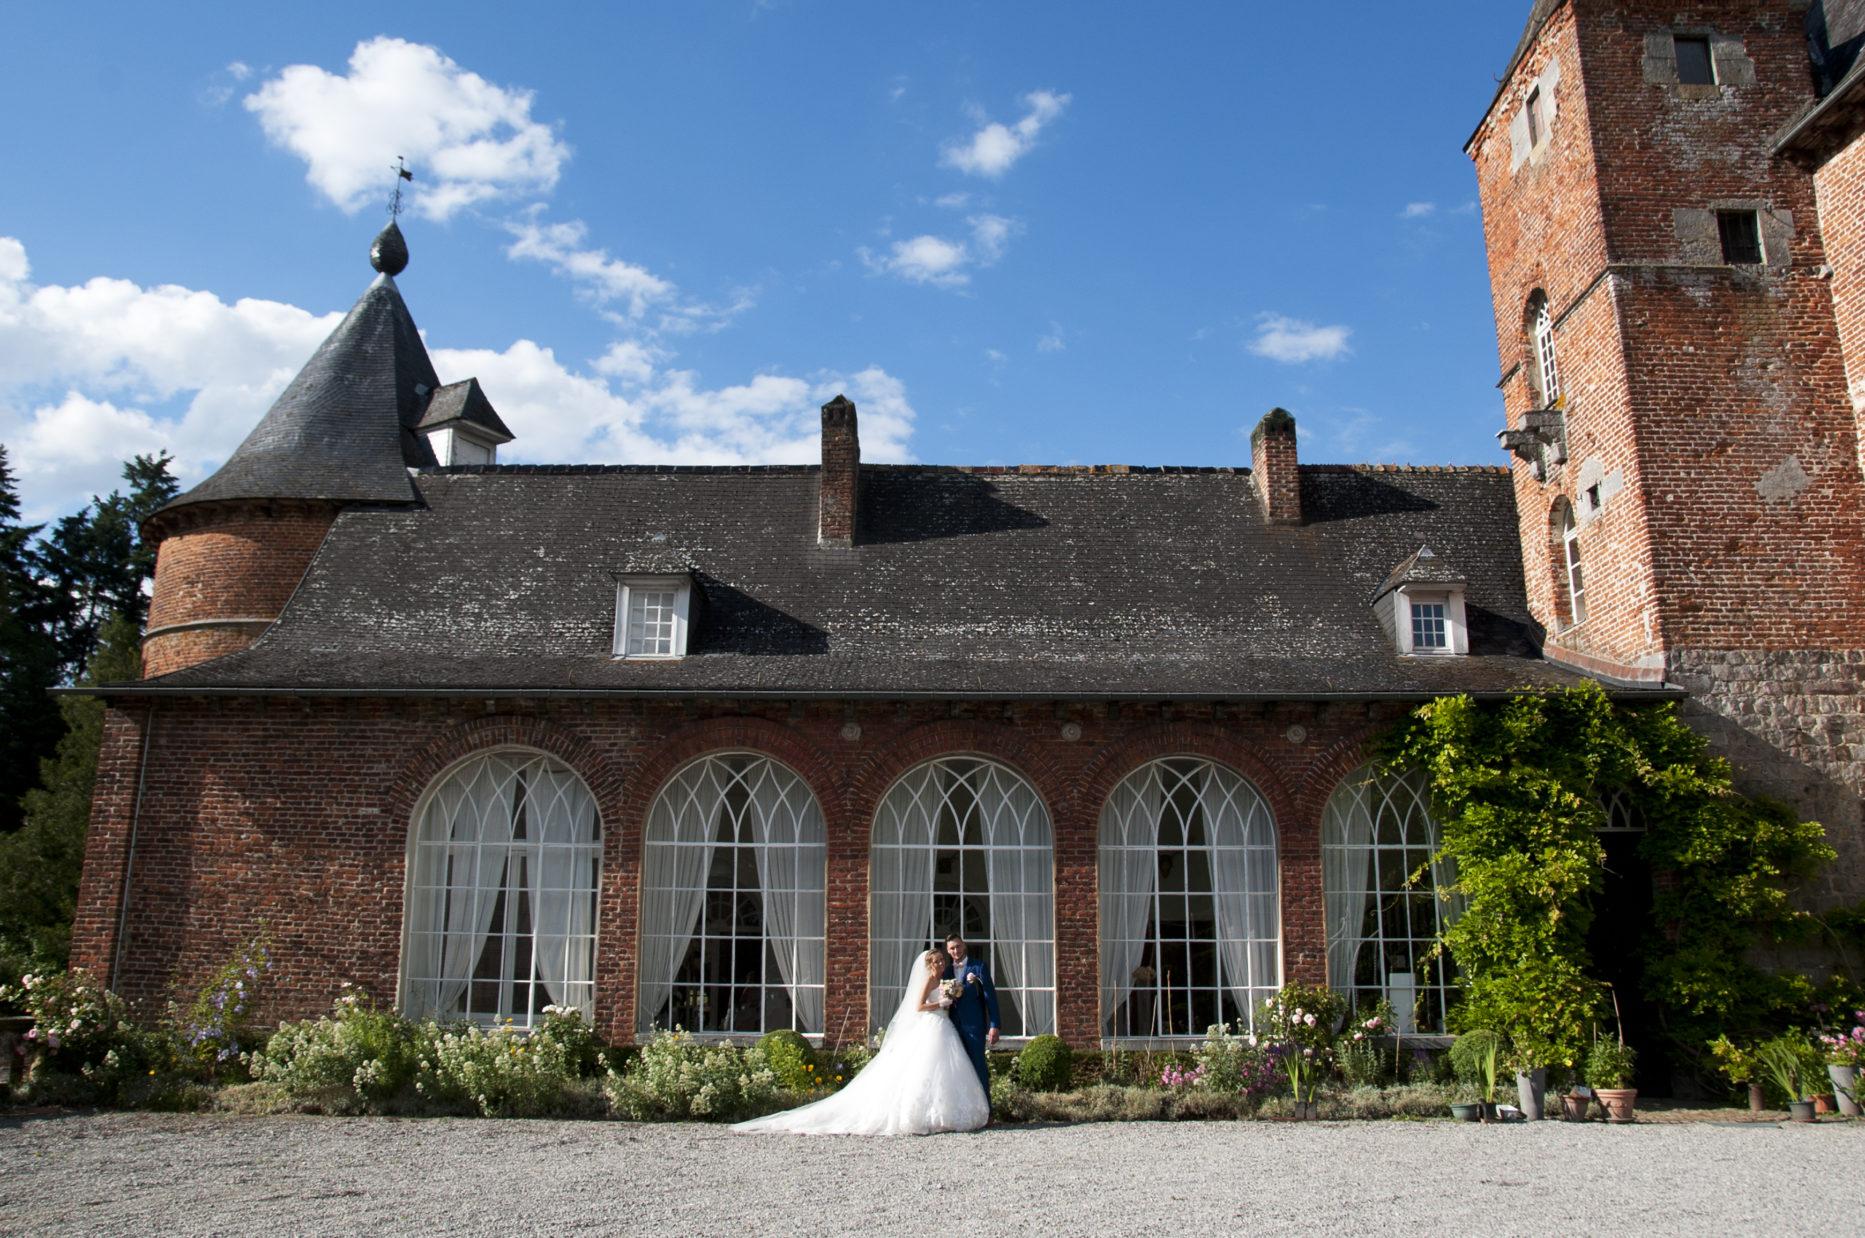 photographe-mariage-nord-pasdecalais-chateau